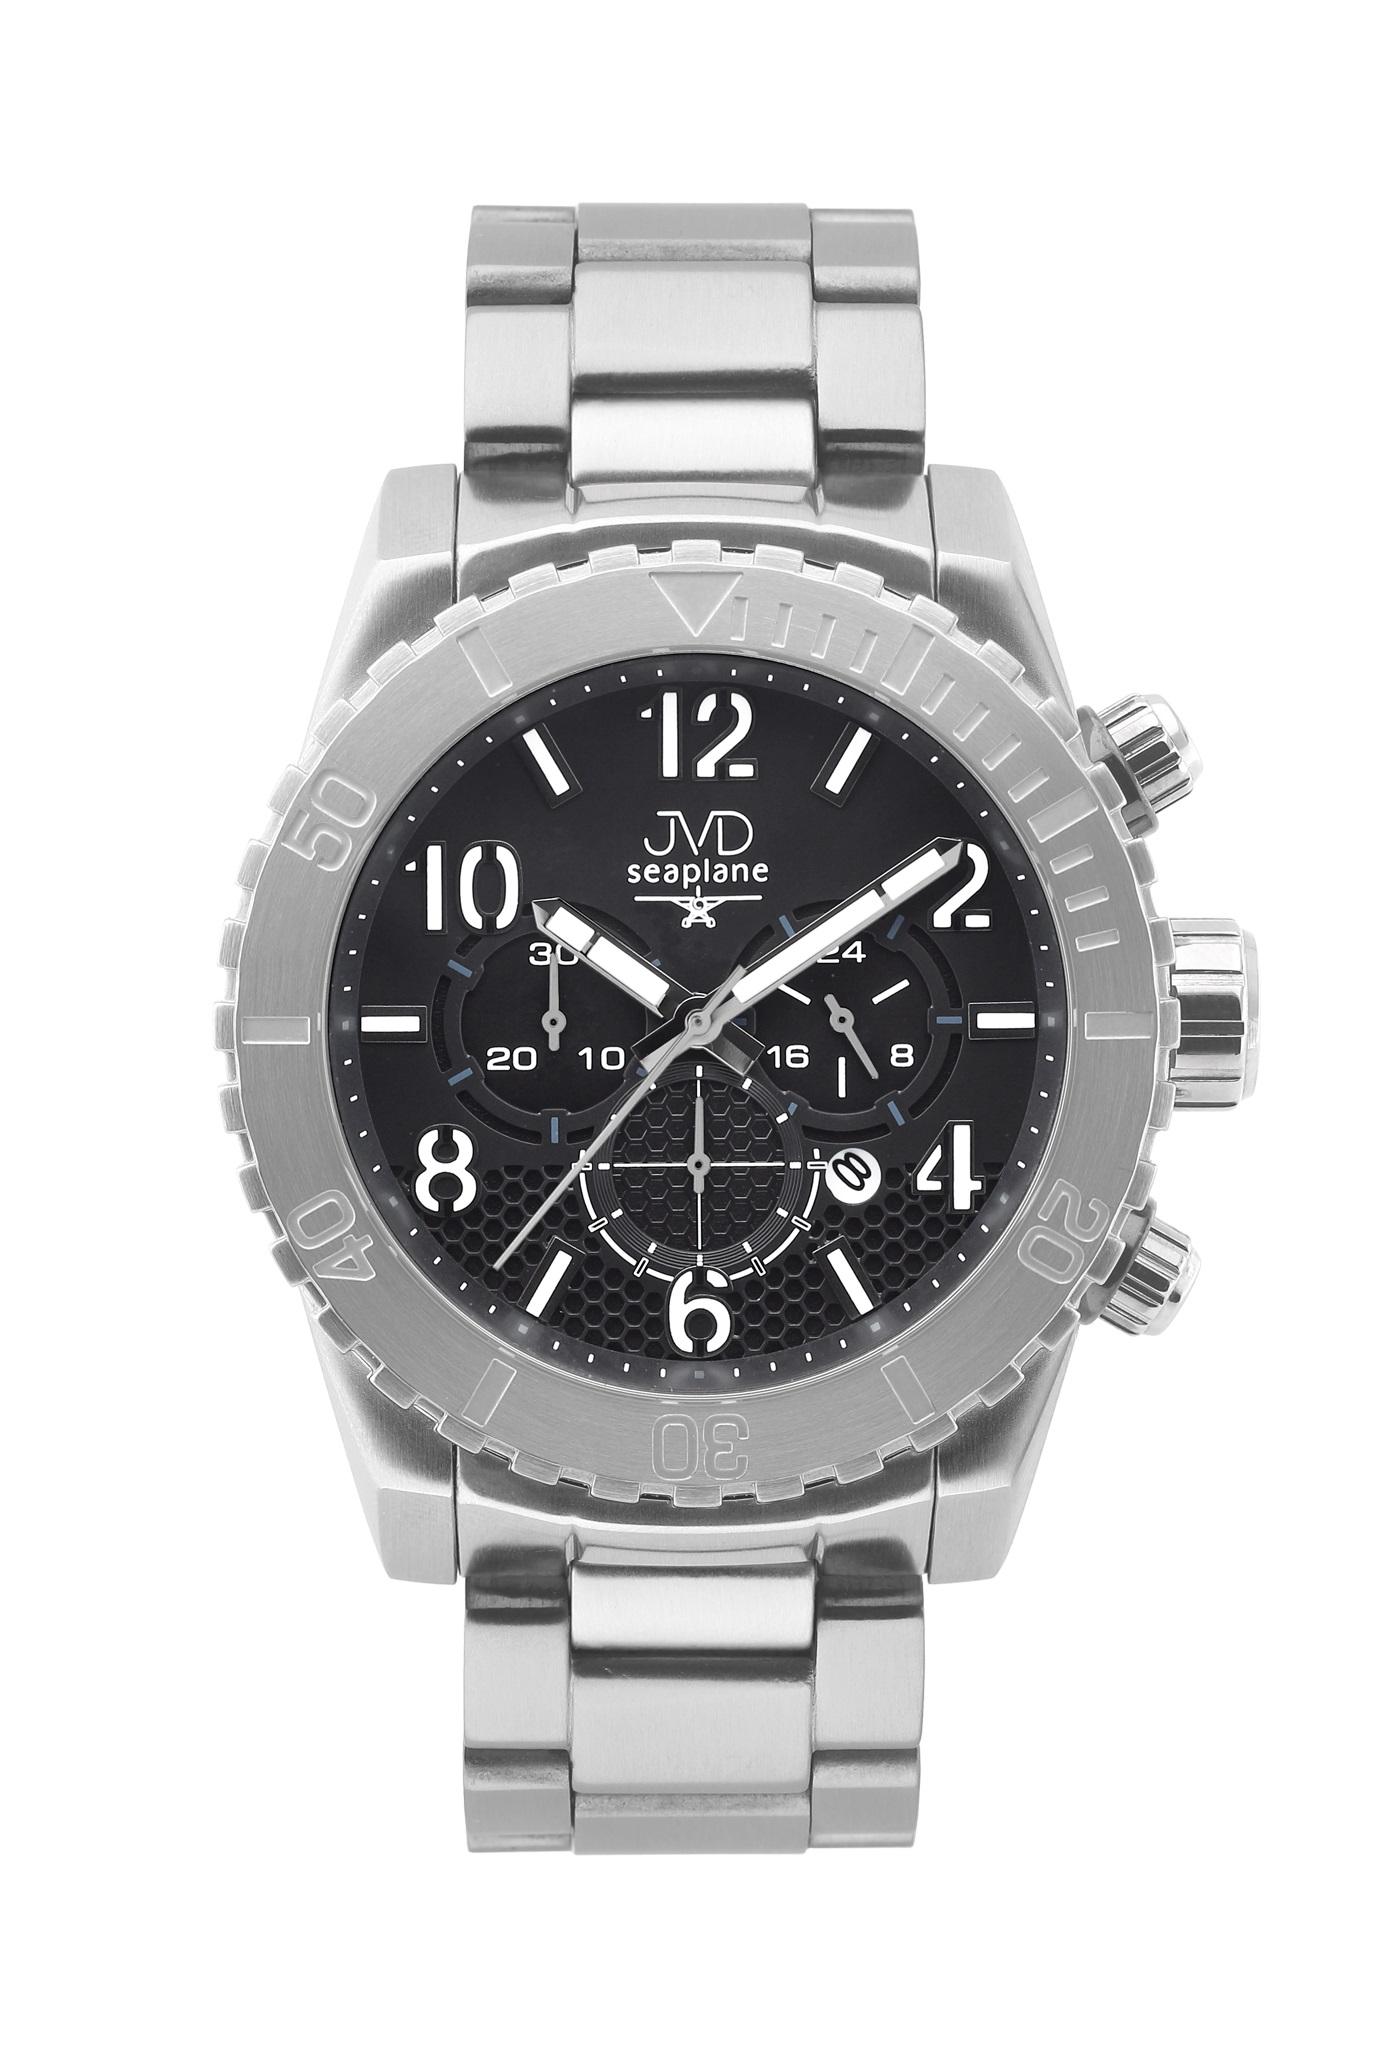 Vodotěsné pánské náramkové hodinky Seaplane METEOR JC703.2 (POŠTOVNÉ ZDARMA!!!)